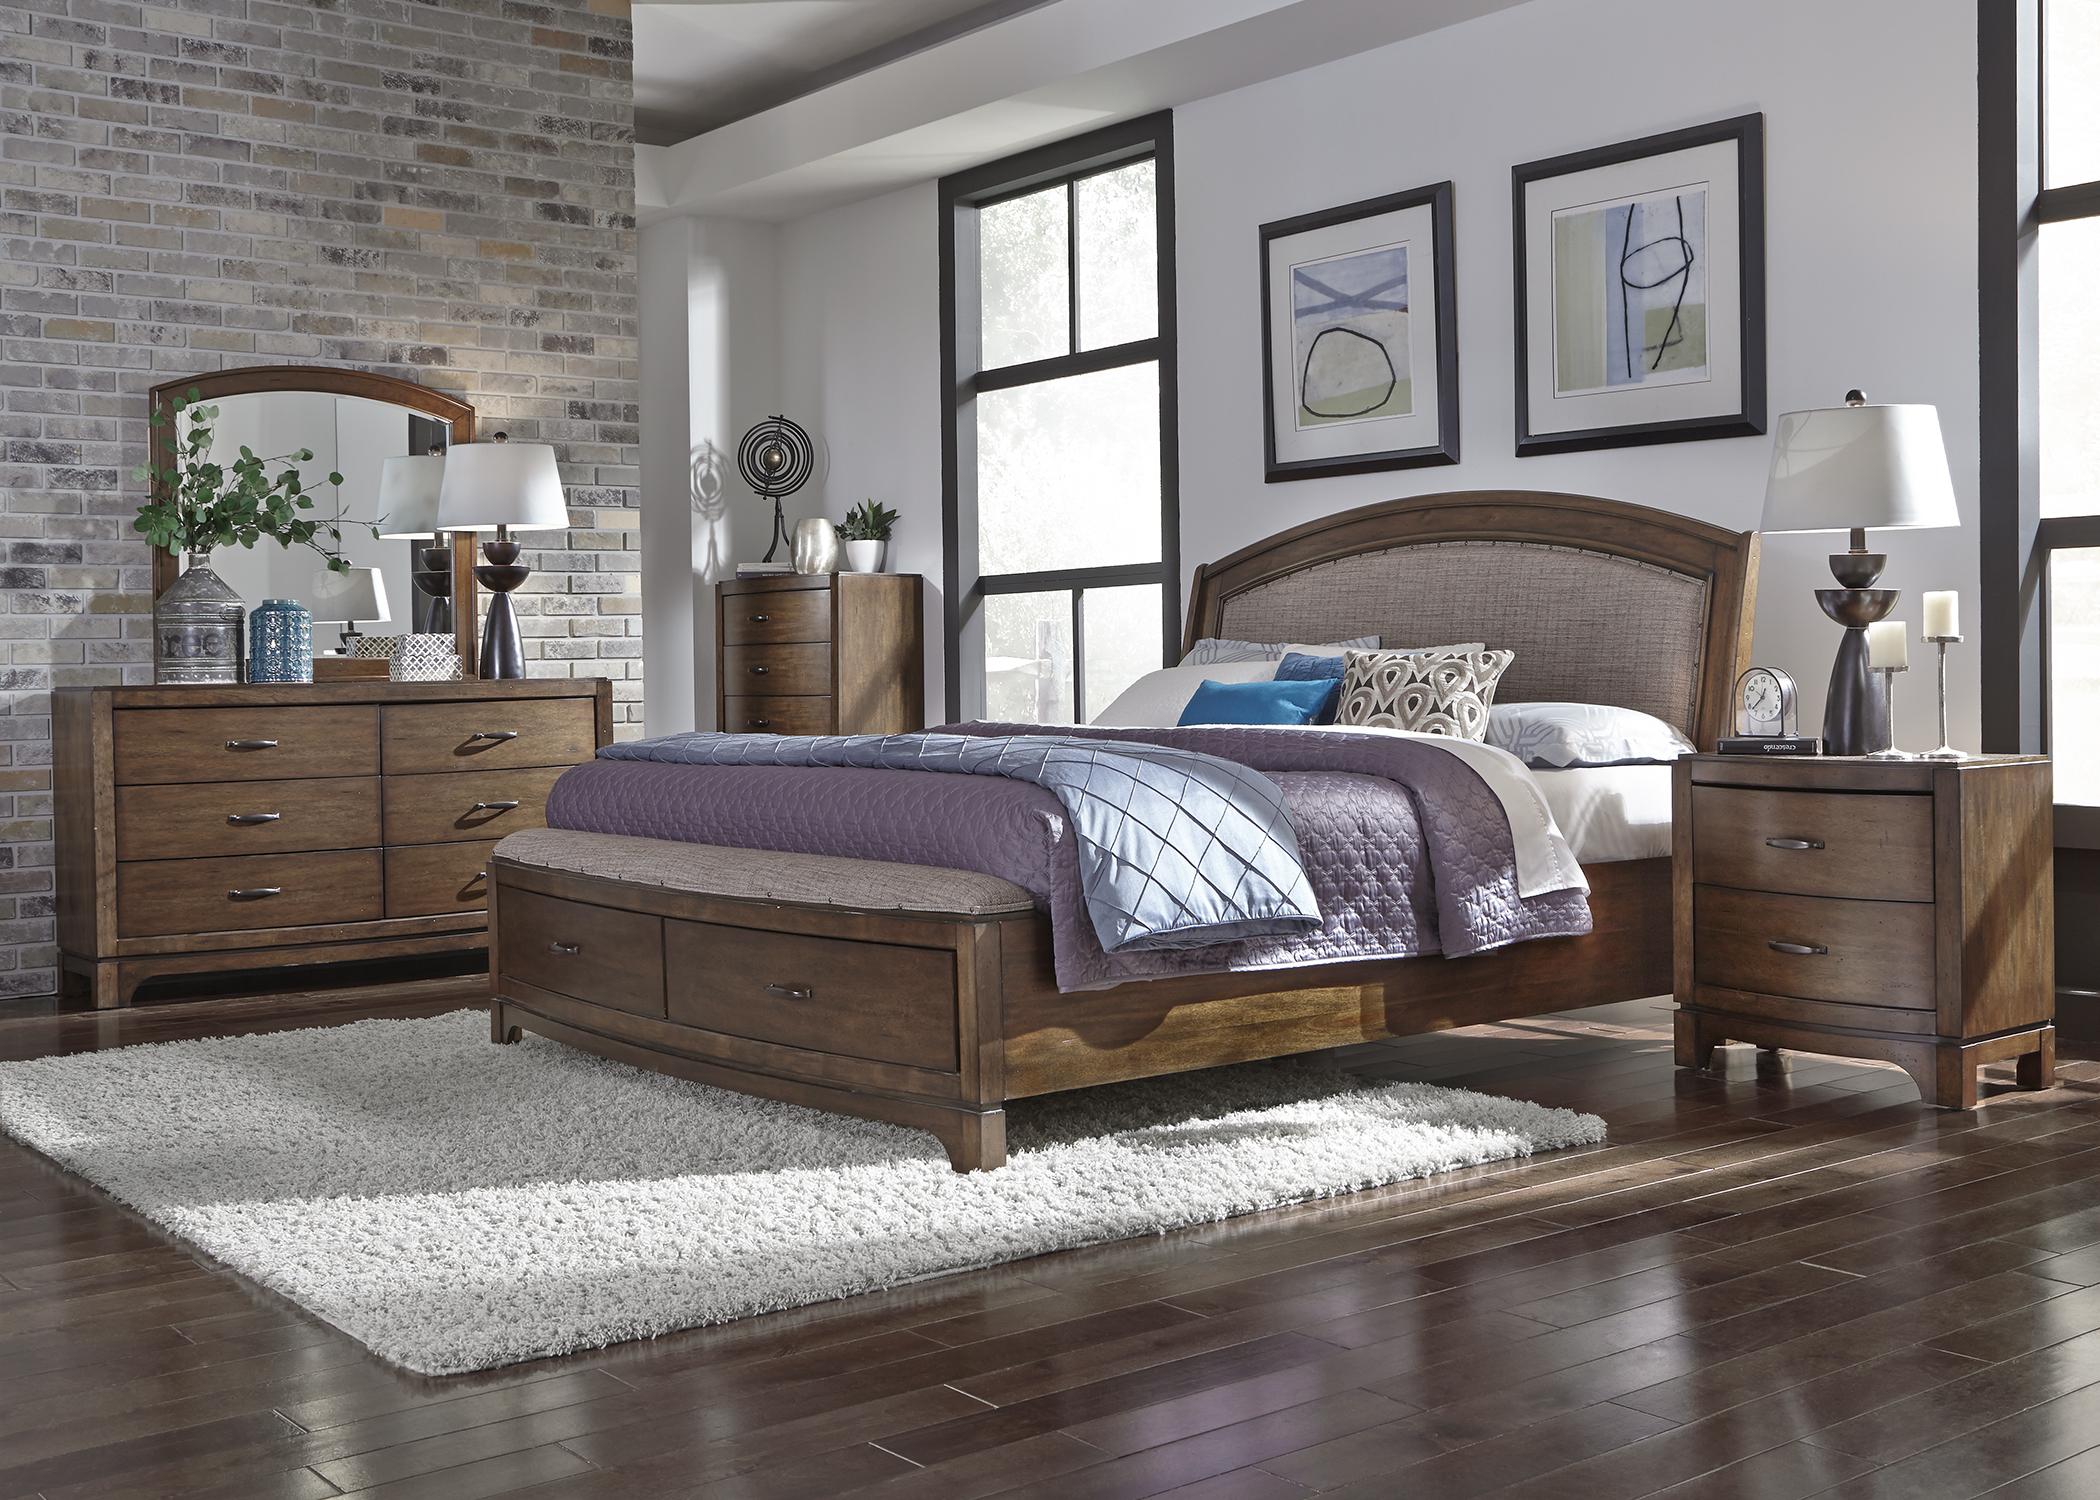 Liberty Furniture Bedroom Sets Liberty Avalon Iii Bedroom 705 Bed Dresser Mirror Chest Nightstand